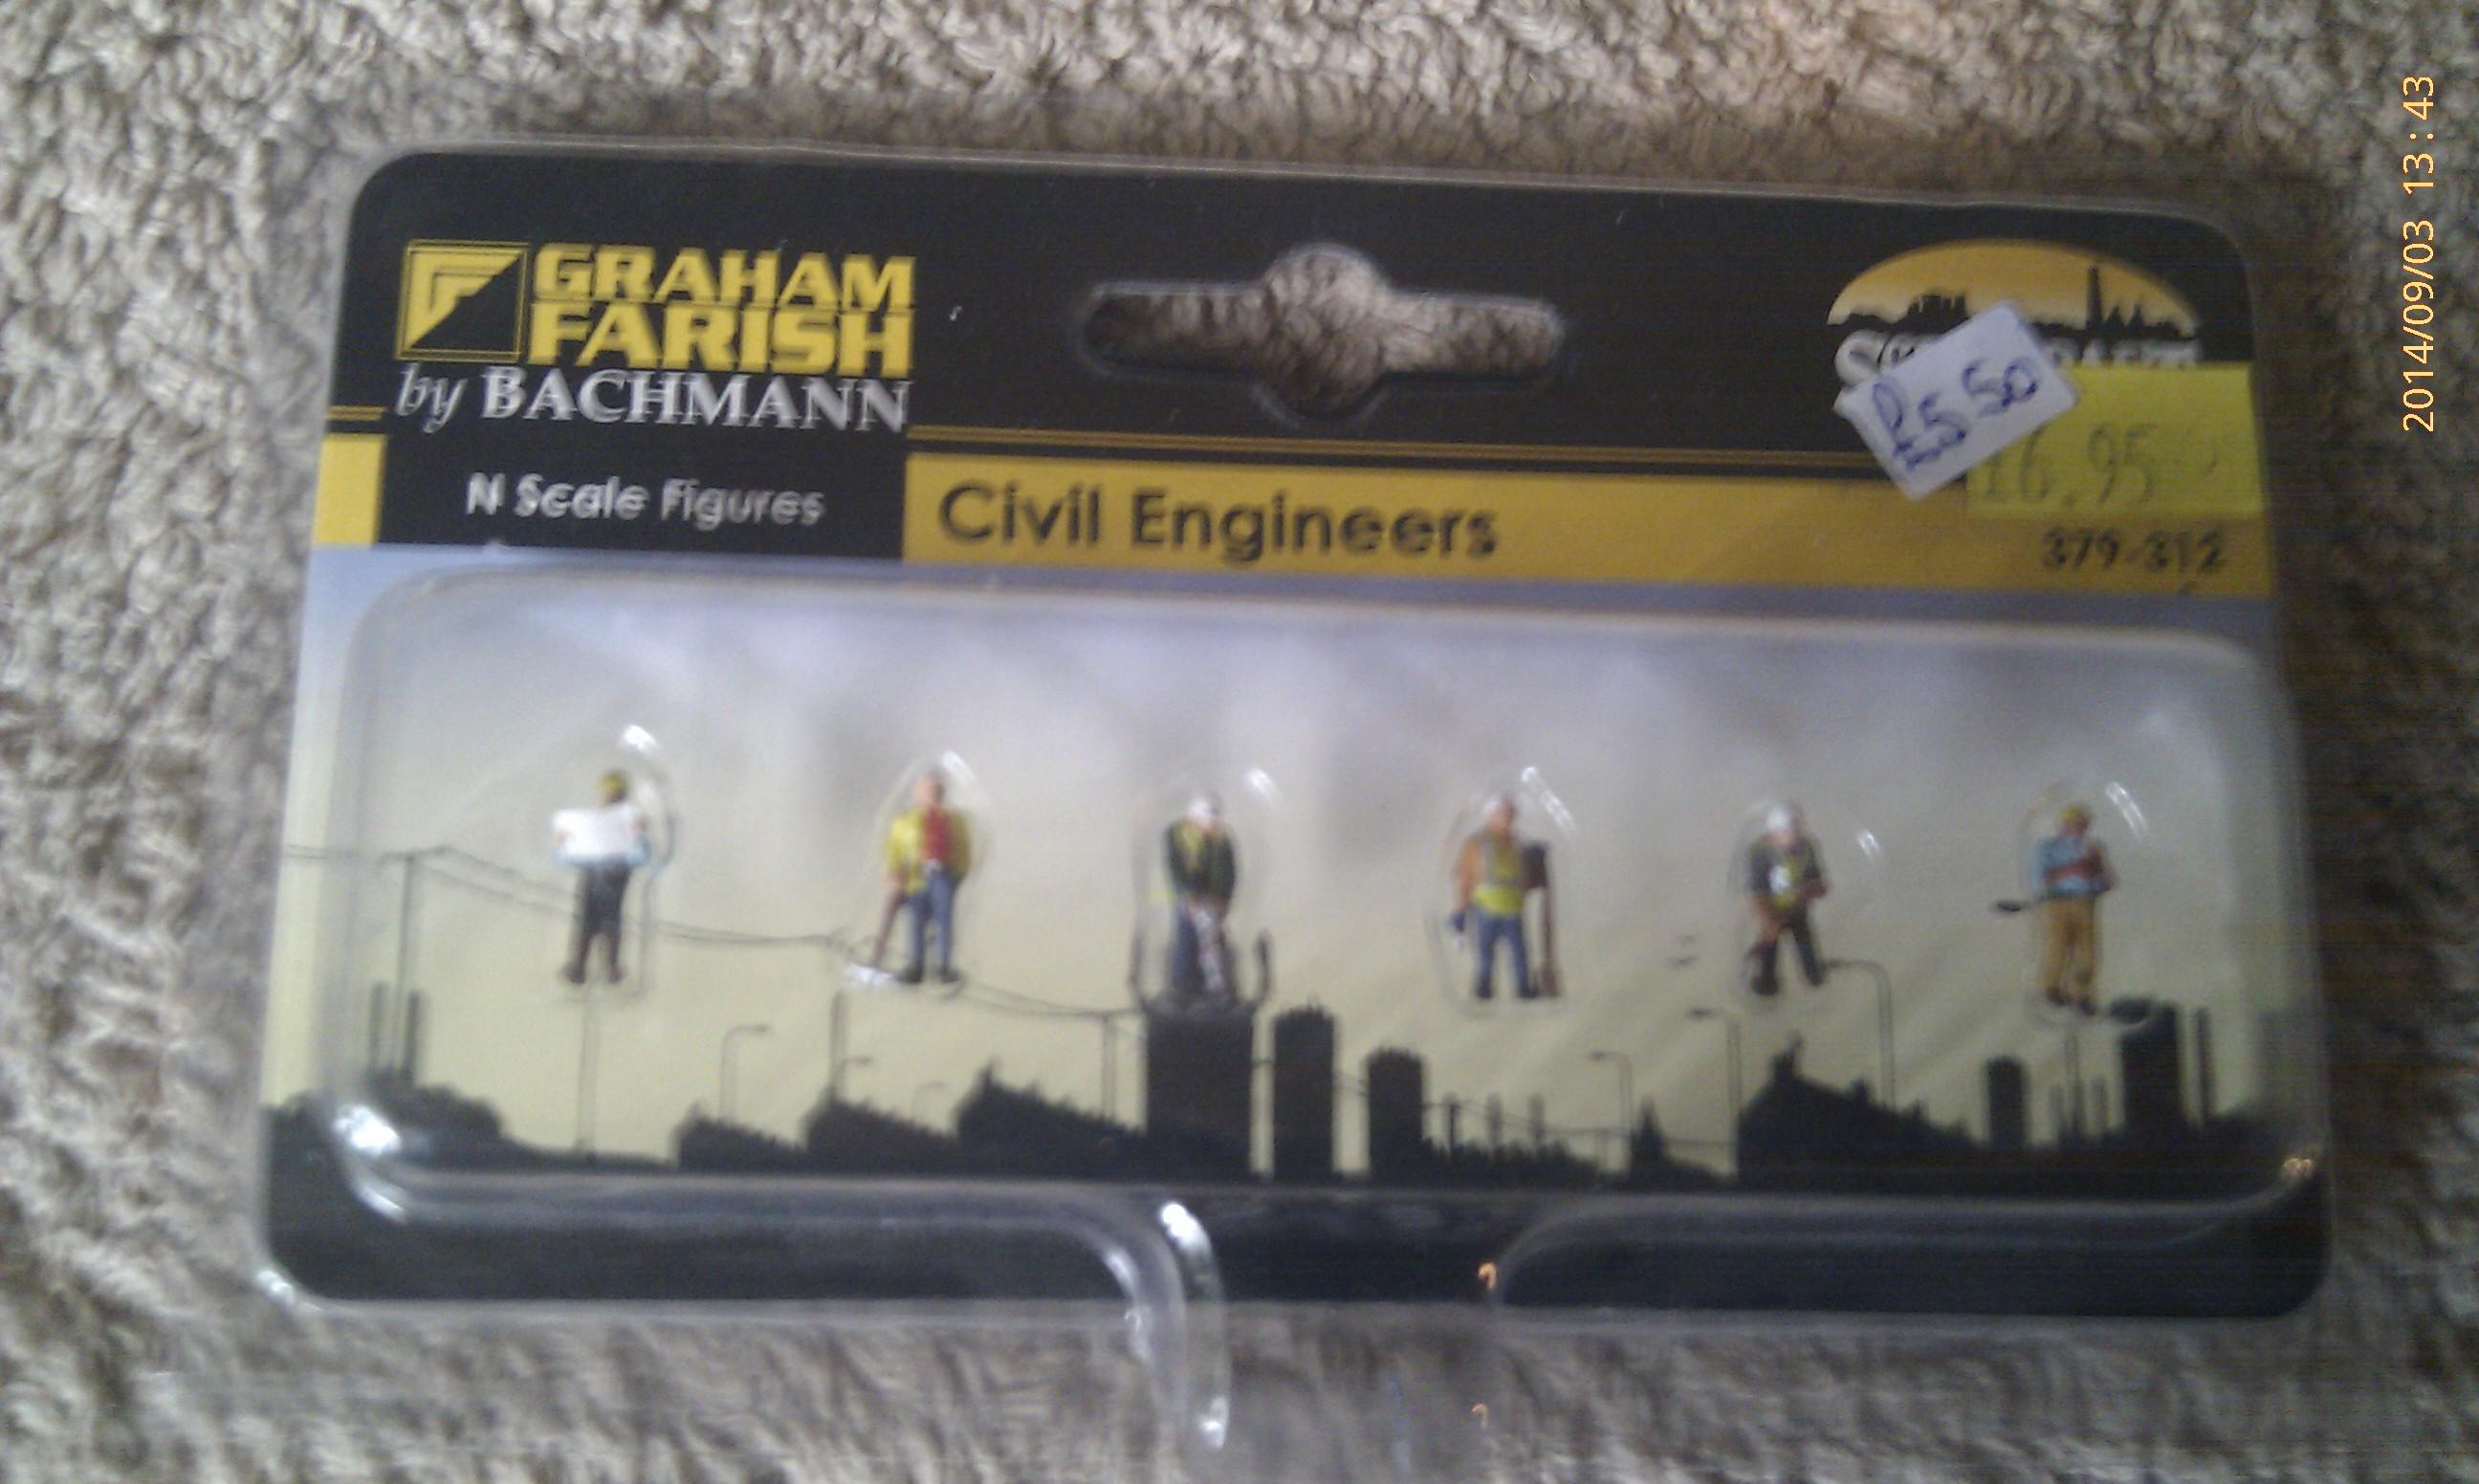 Civil Engineers 379-312